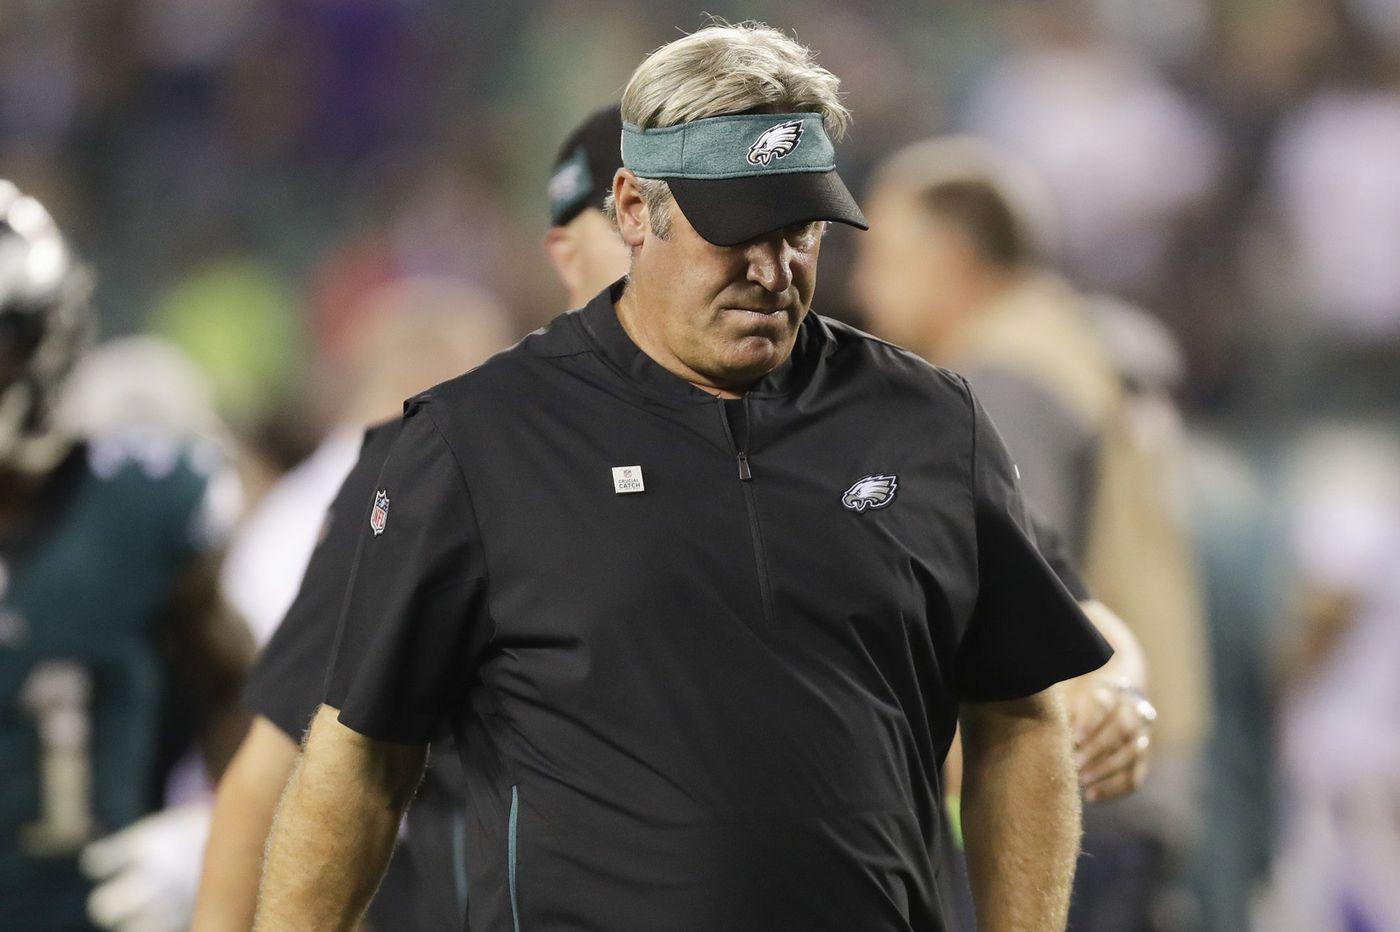 Doug Pederson accepts and deserves blame for Eagles loss | Bob Brookover